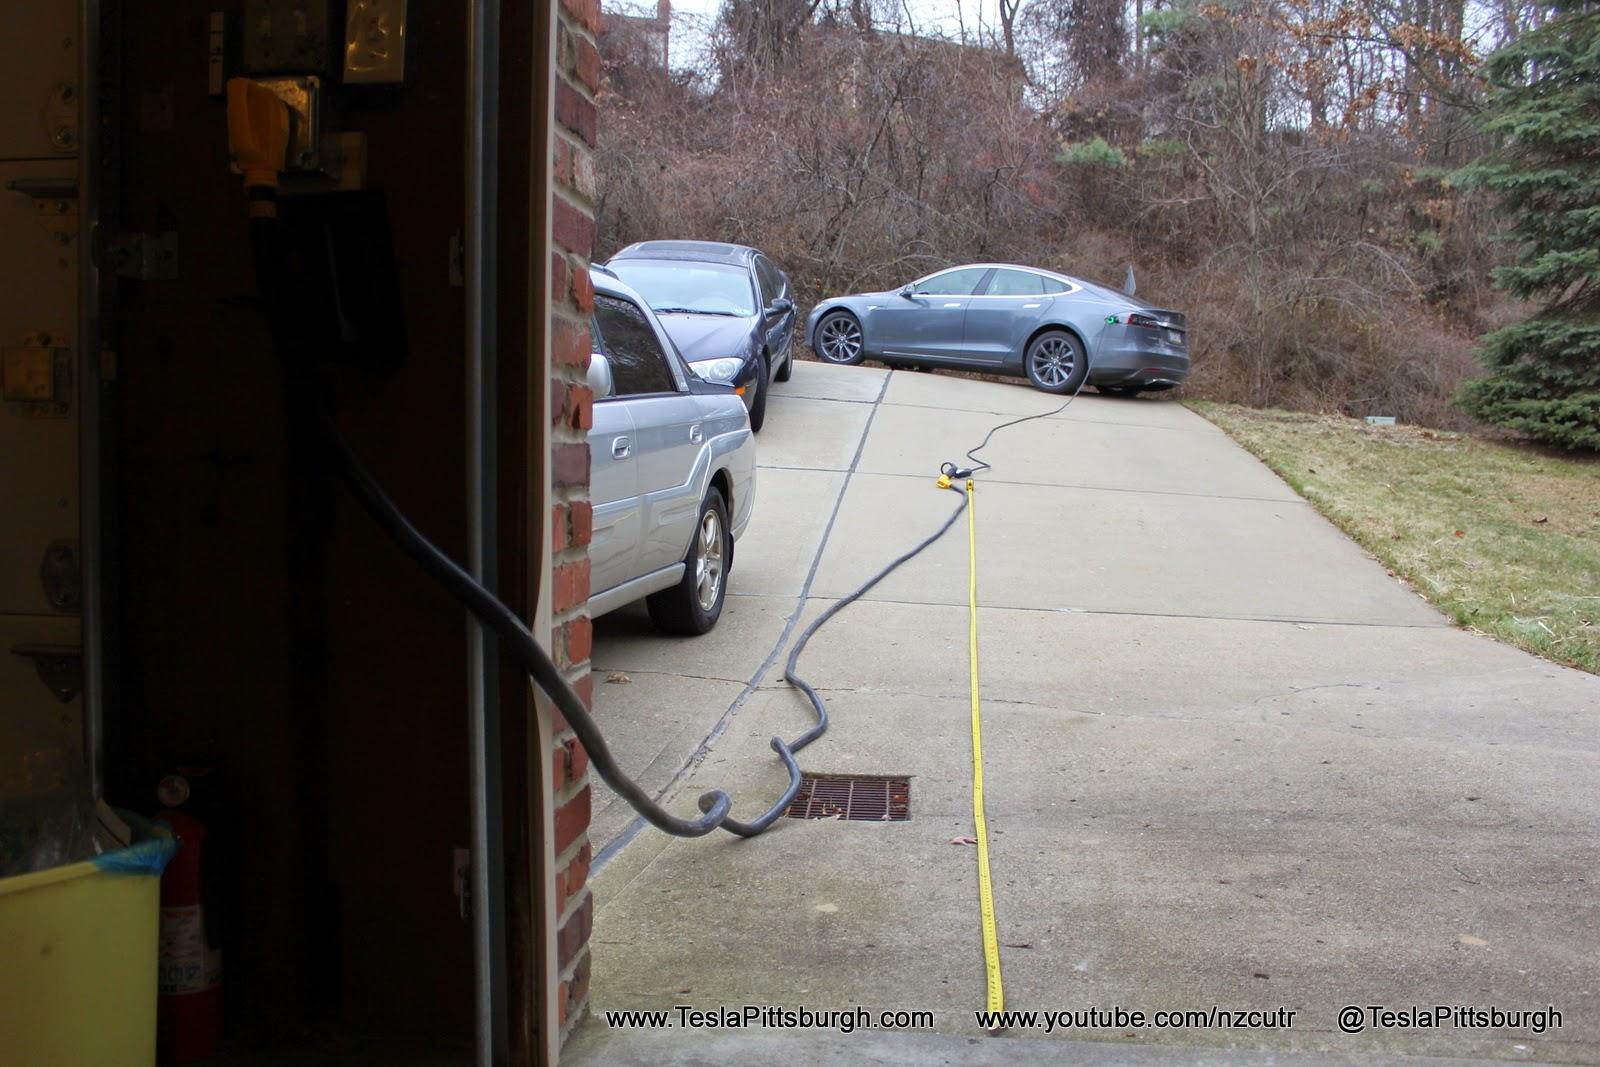 Tesla Umc Extension Cord Via Camco 50 Amp 30 Powergrip